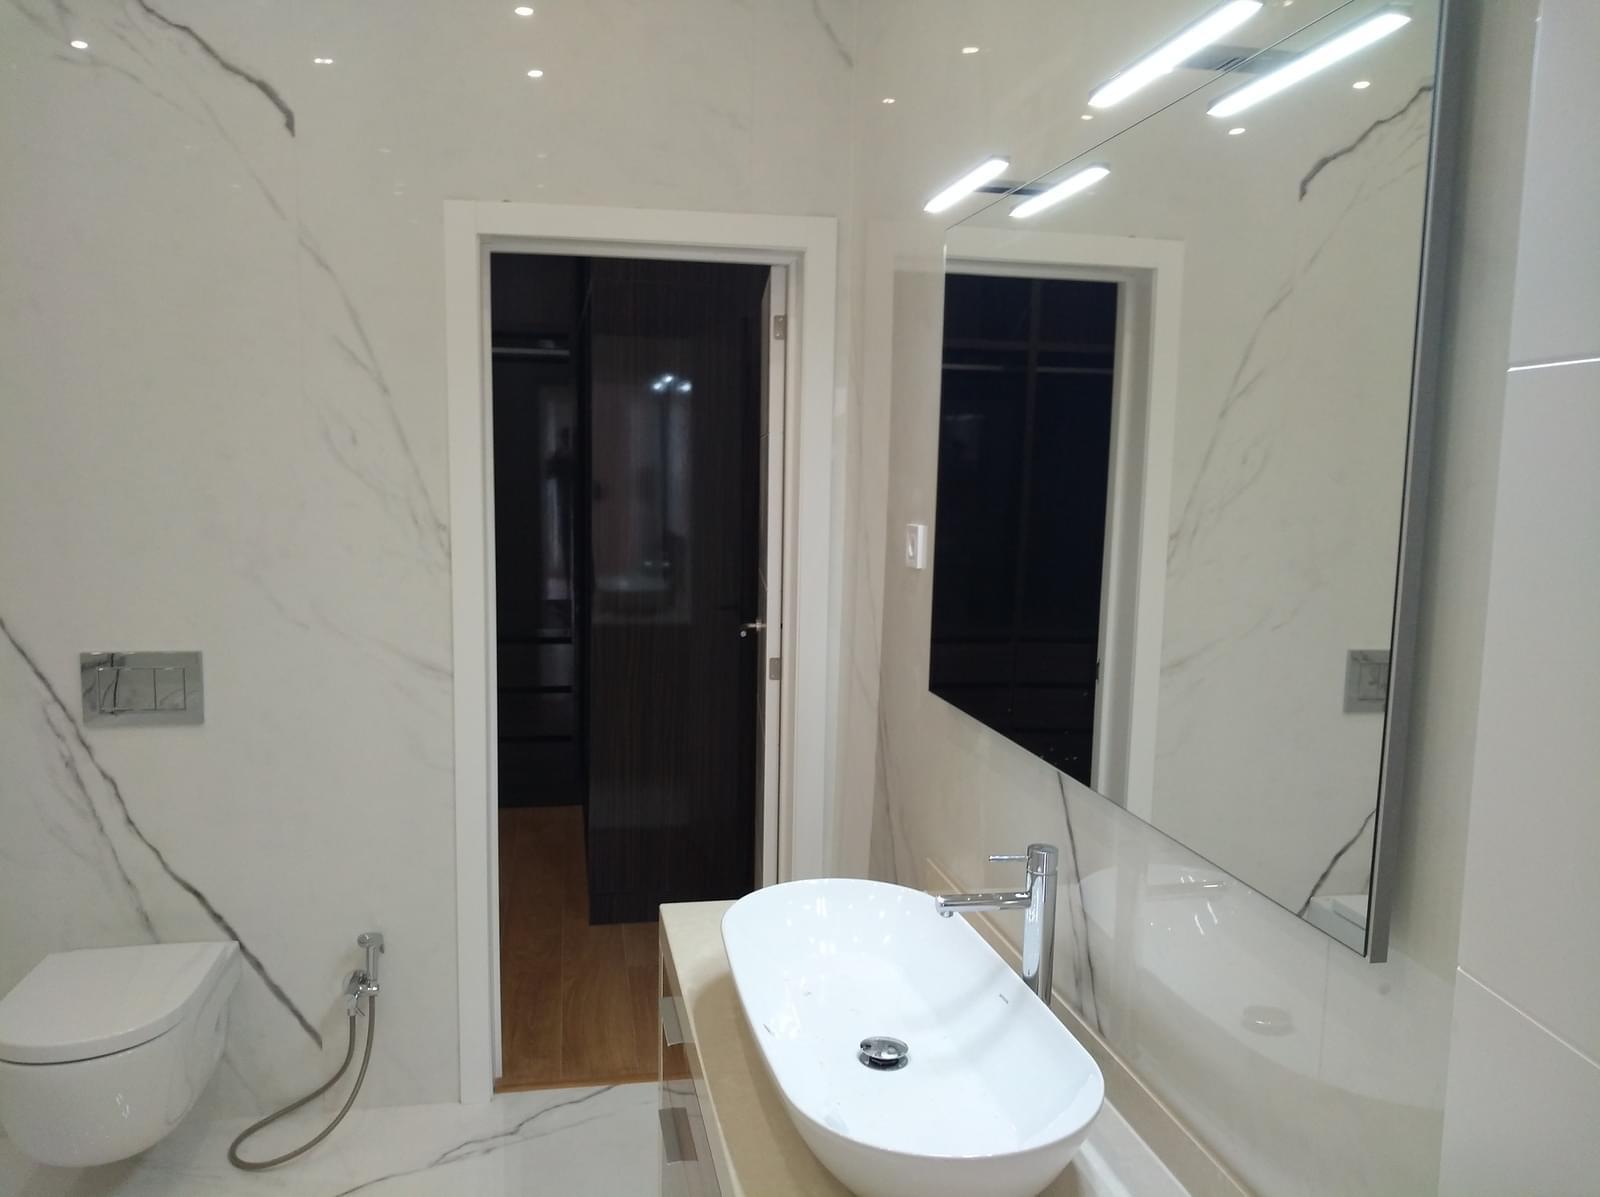 pf17316-apartamento-t2-lisboa-086b4d99-c0bb-447b-b131-731039a4f442